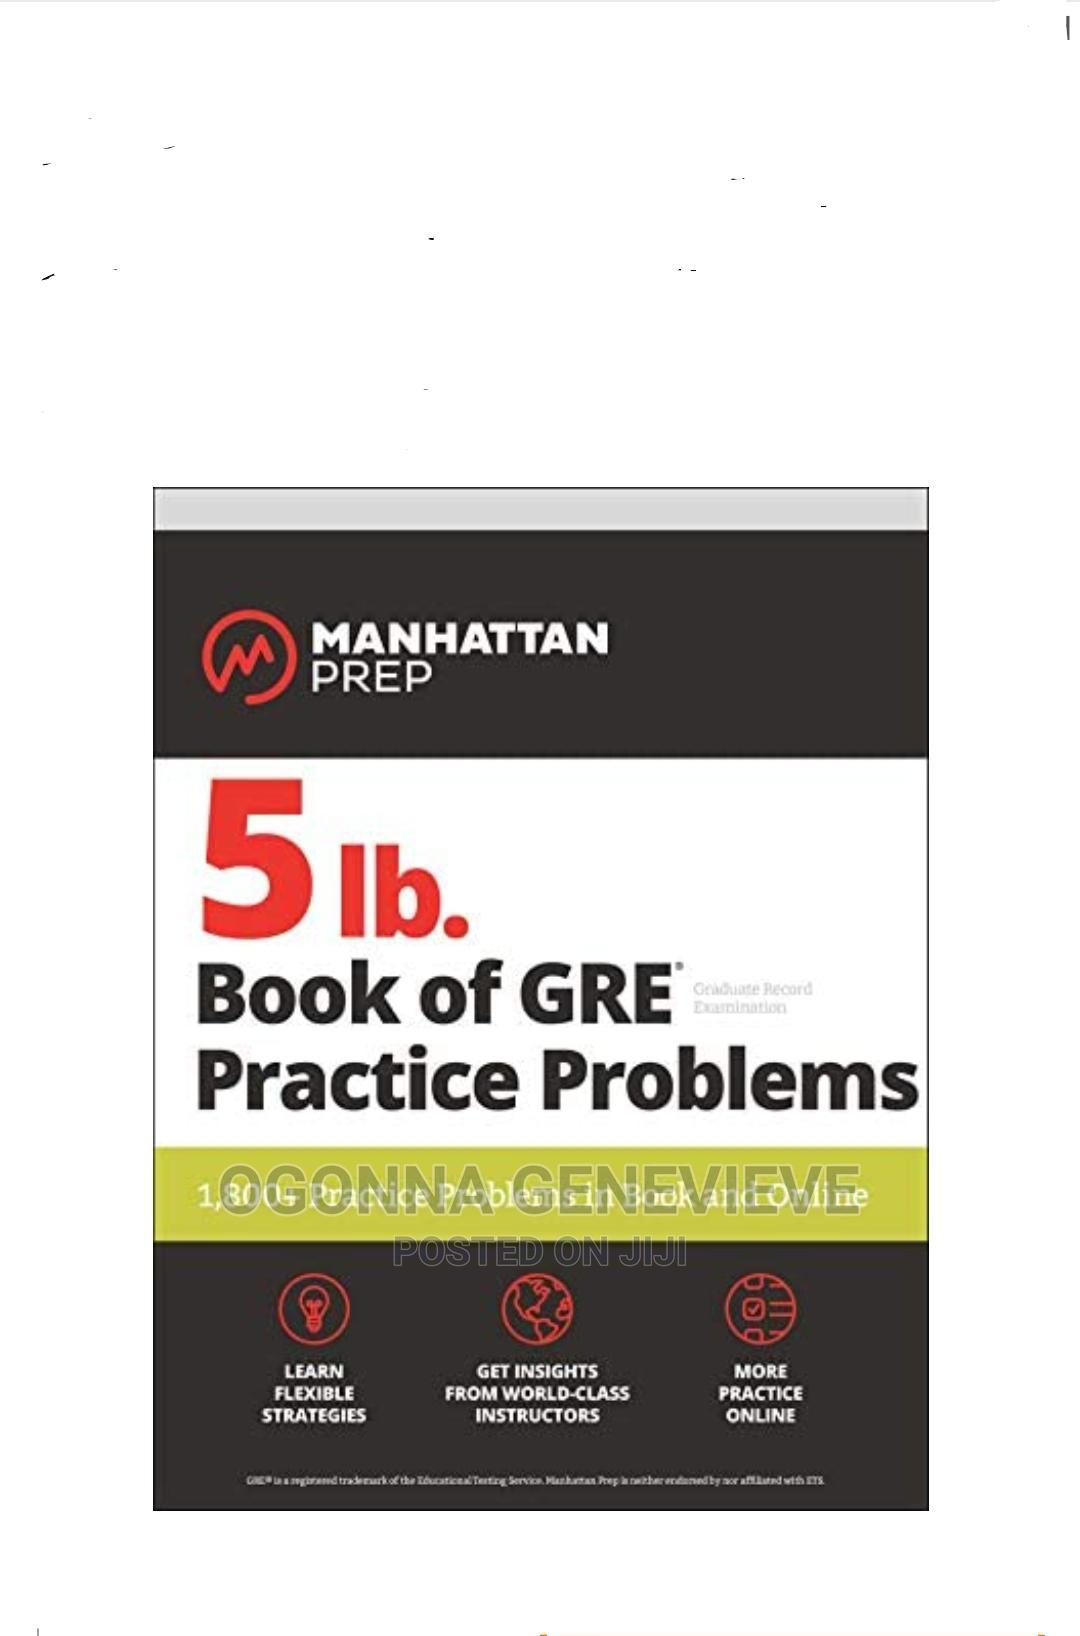 Manhattan Prep 5ib Book of GRE Practical Problems